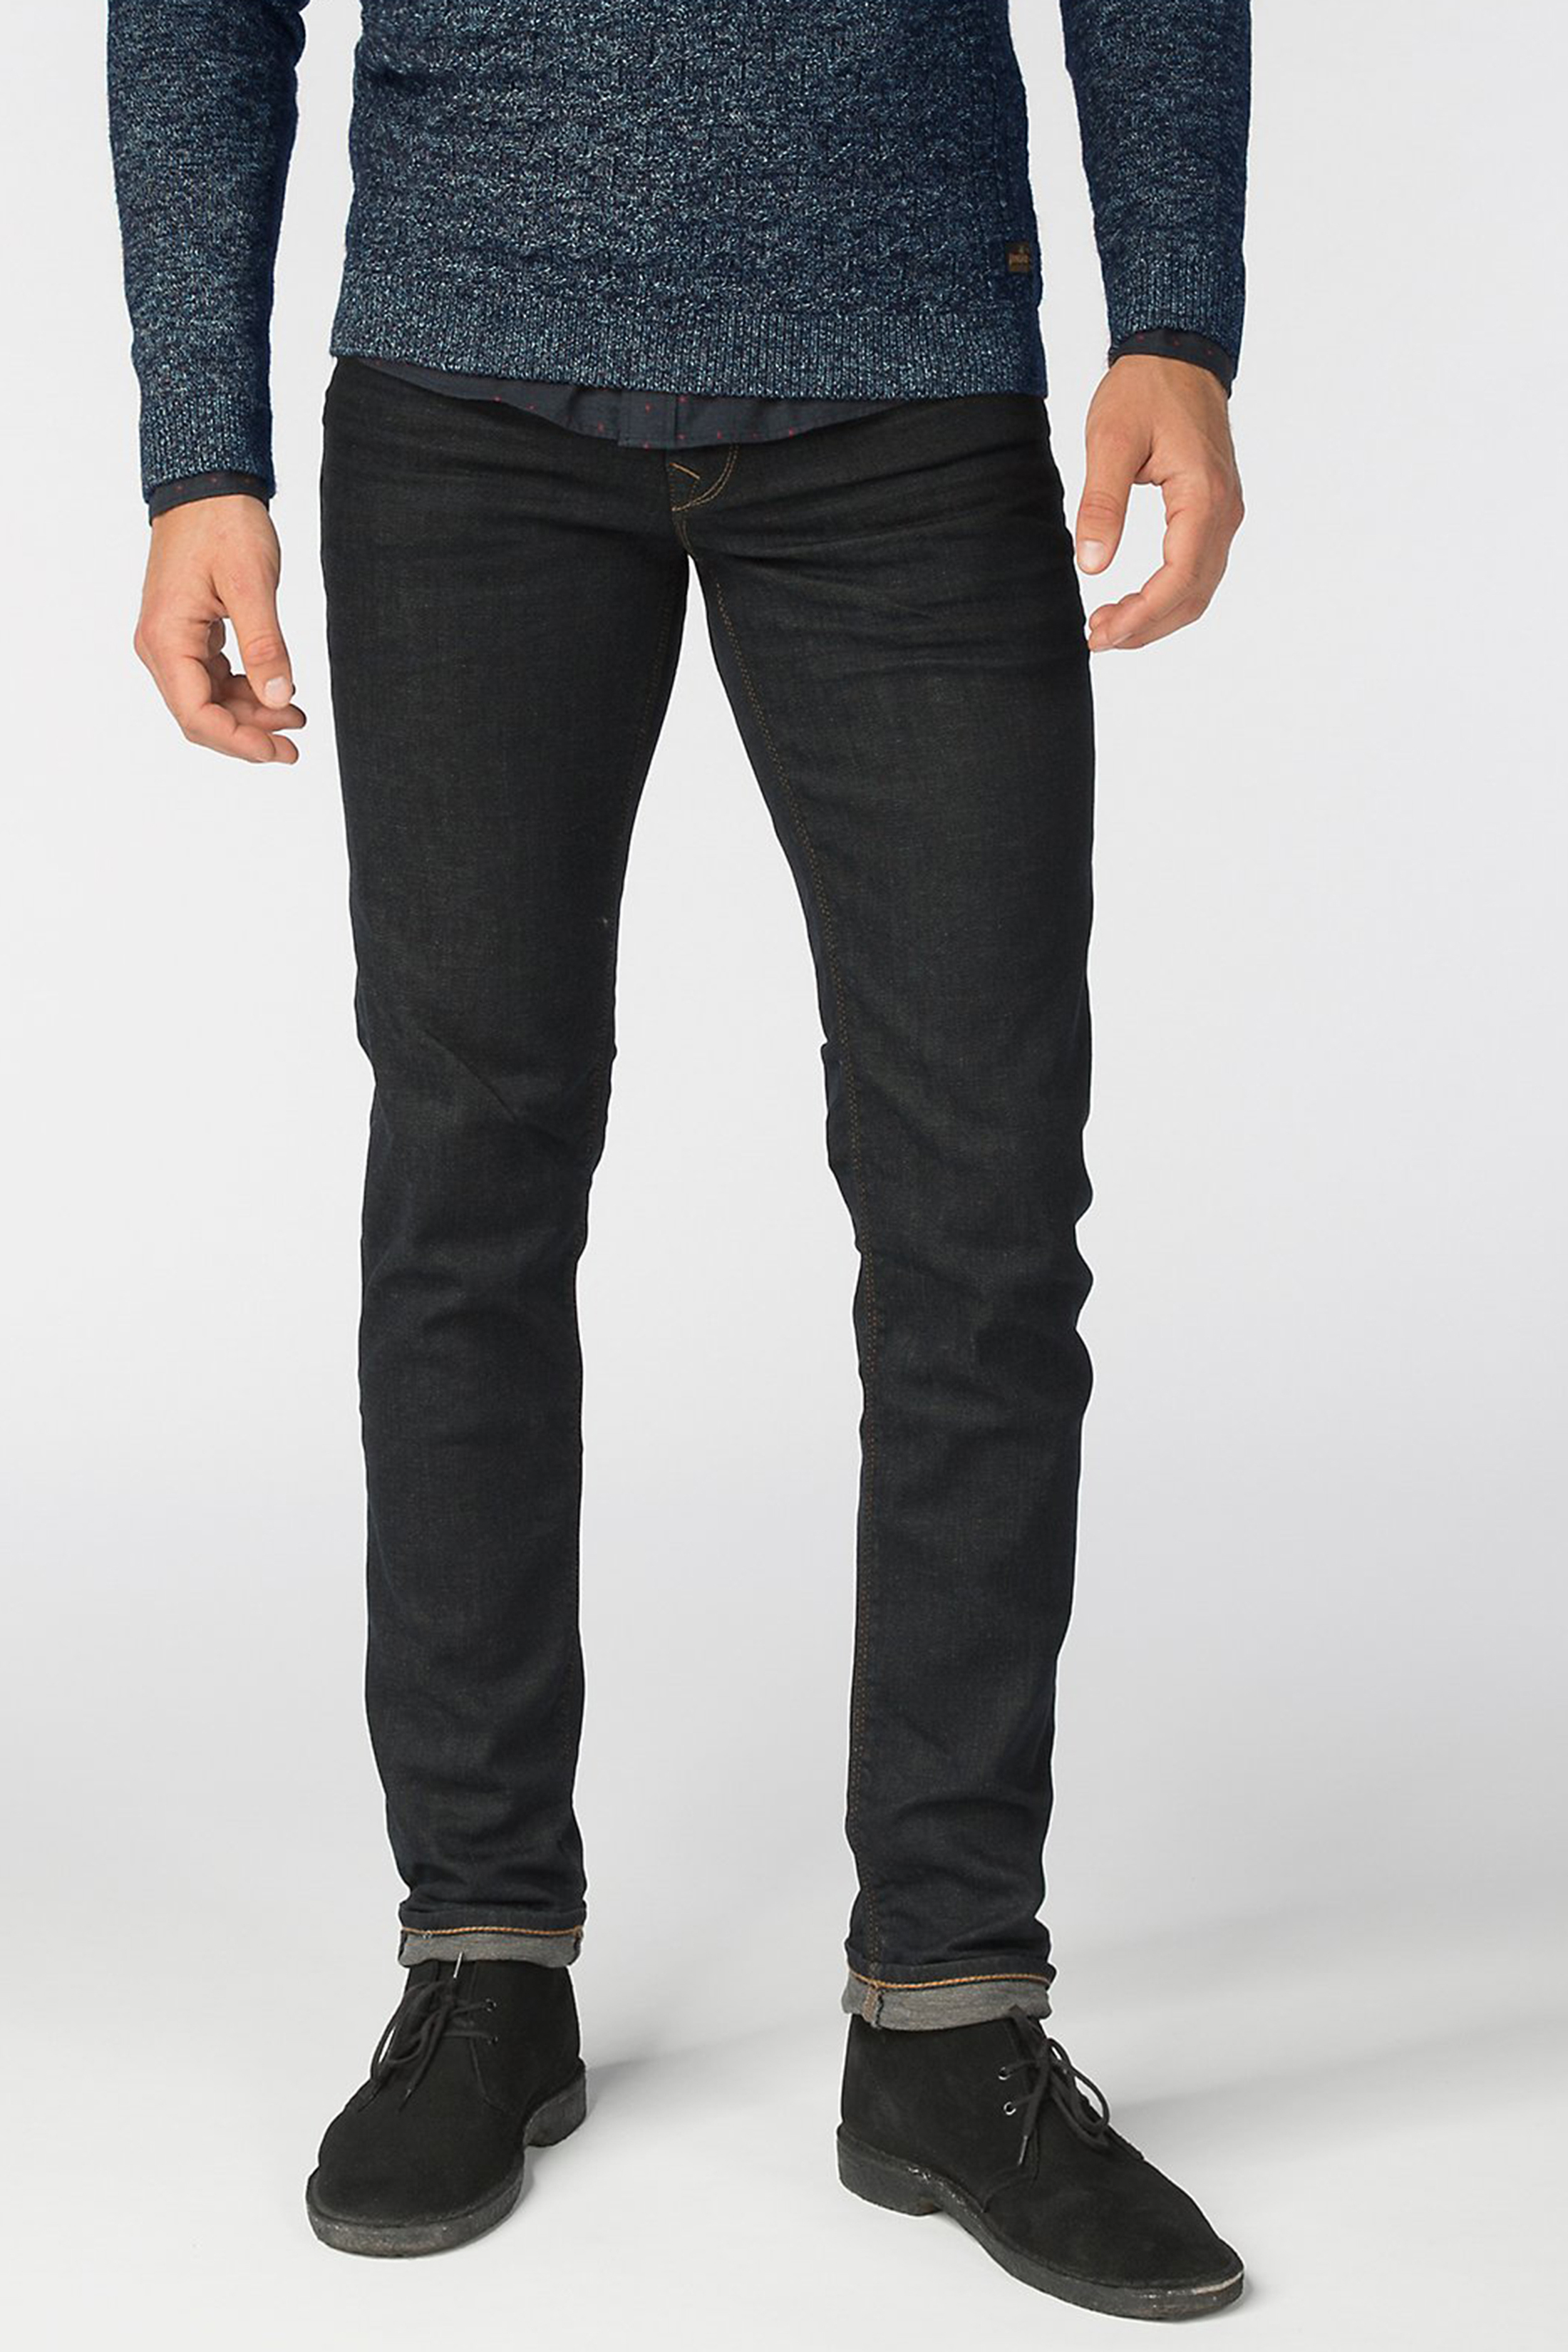 Vanguard V7 Rider Jeans Slim Fit CCR foto 5